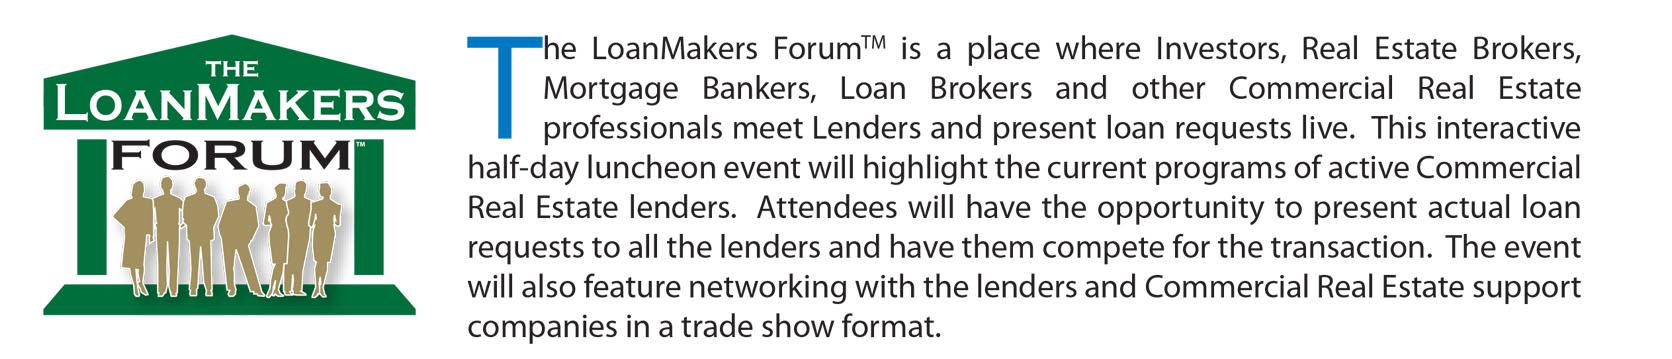 loanmakers forum